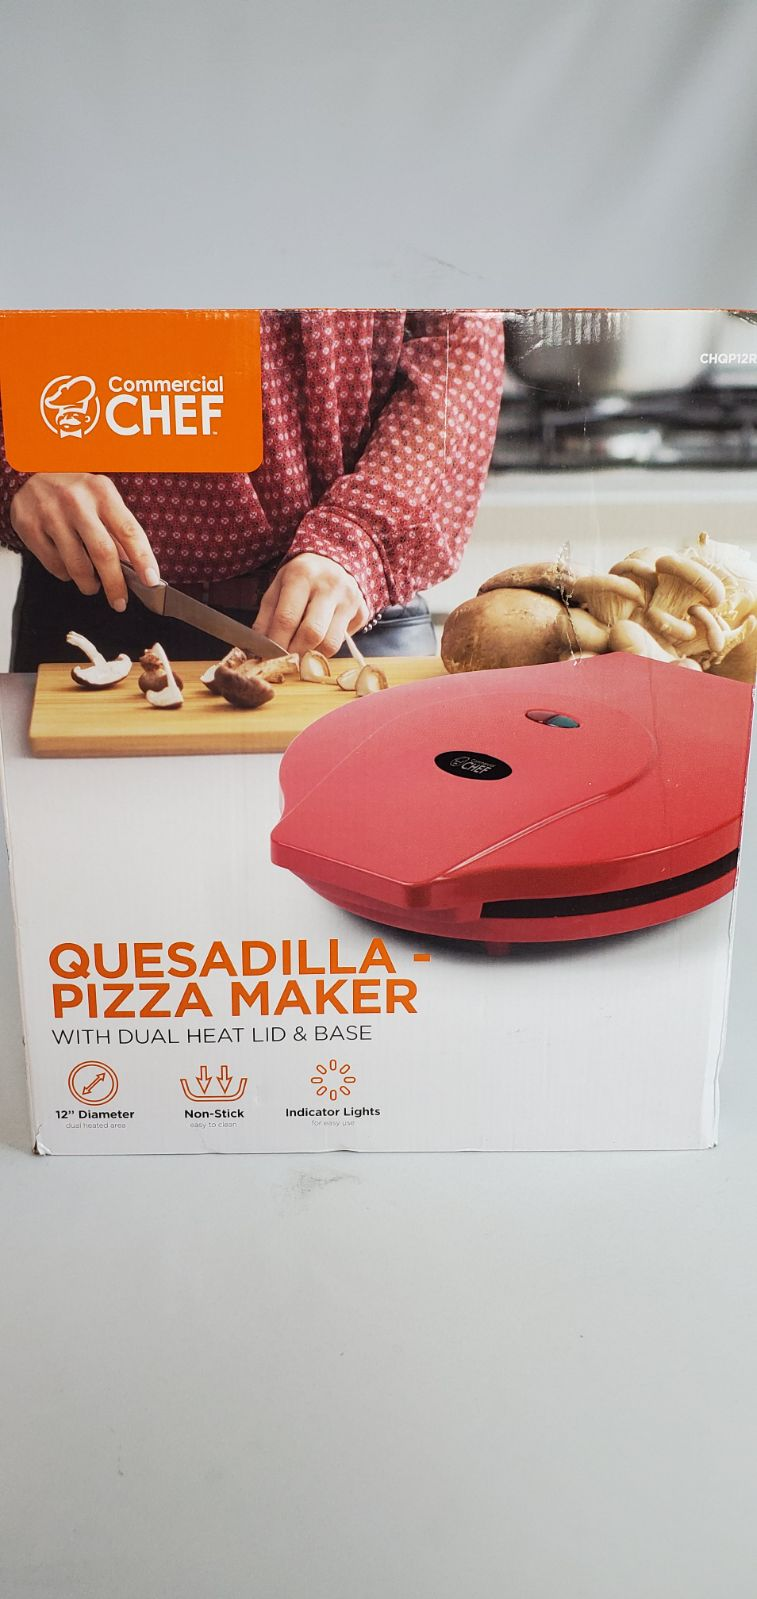 Quesadilla and Pizza Maker